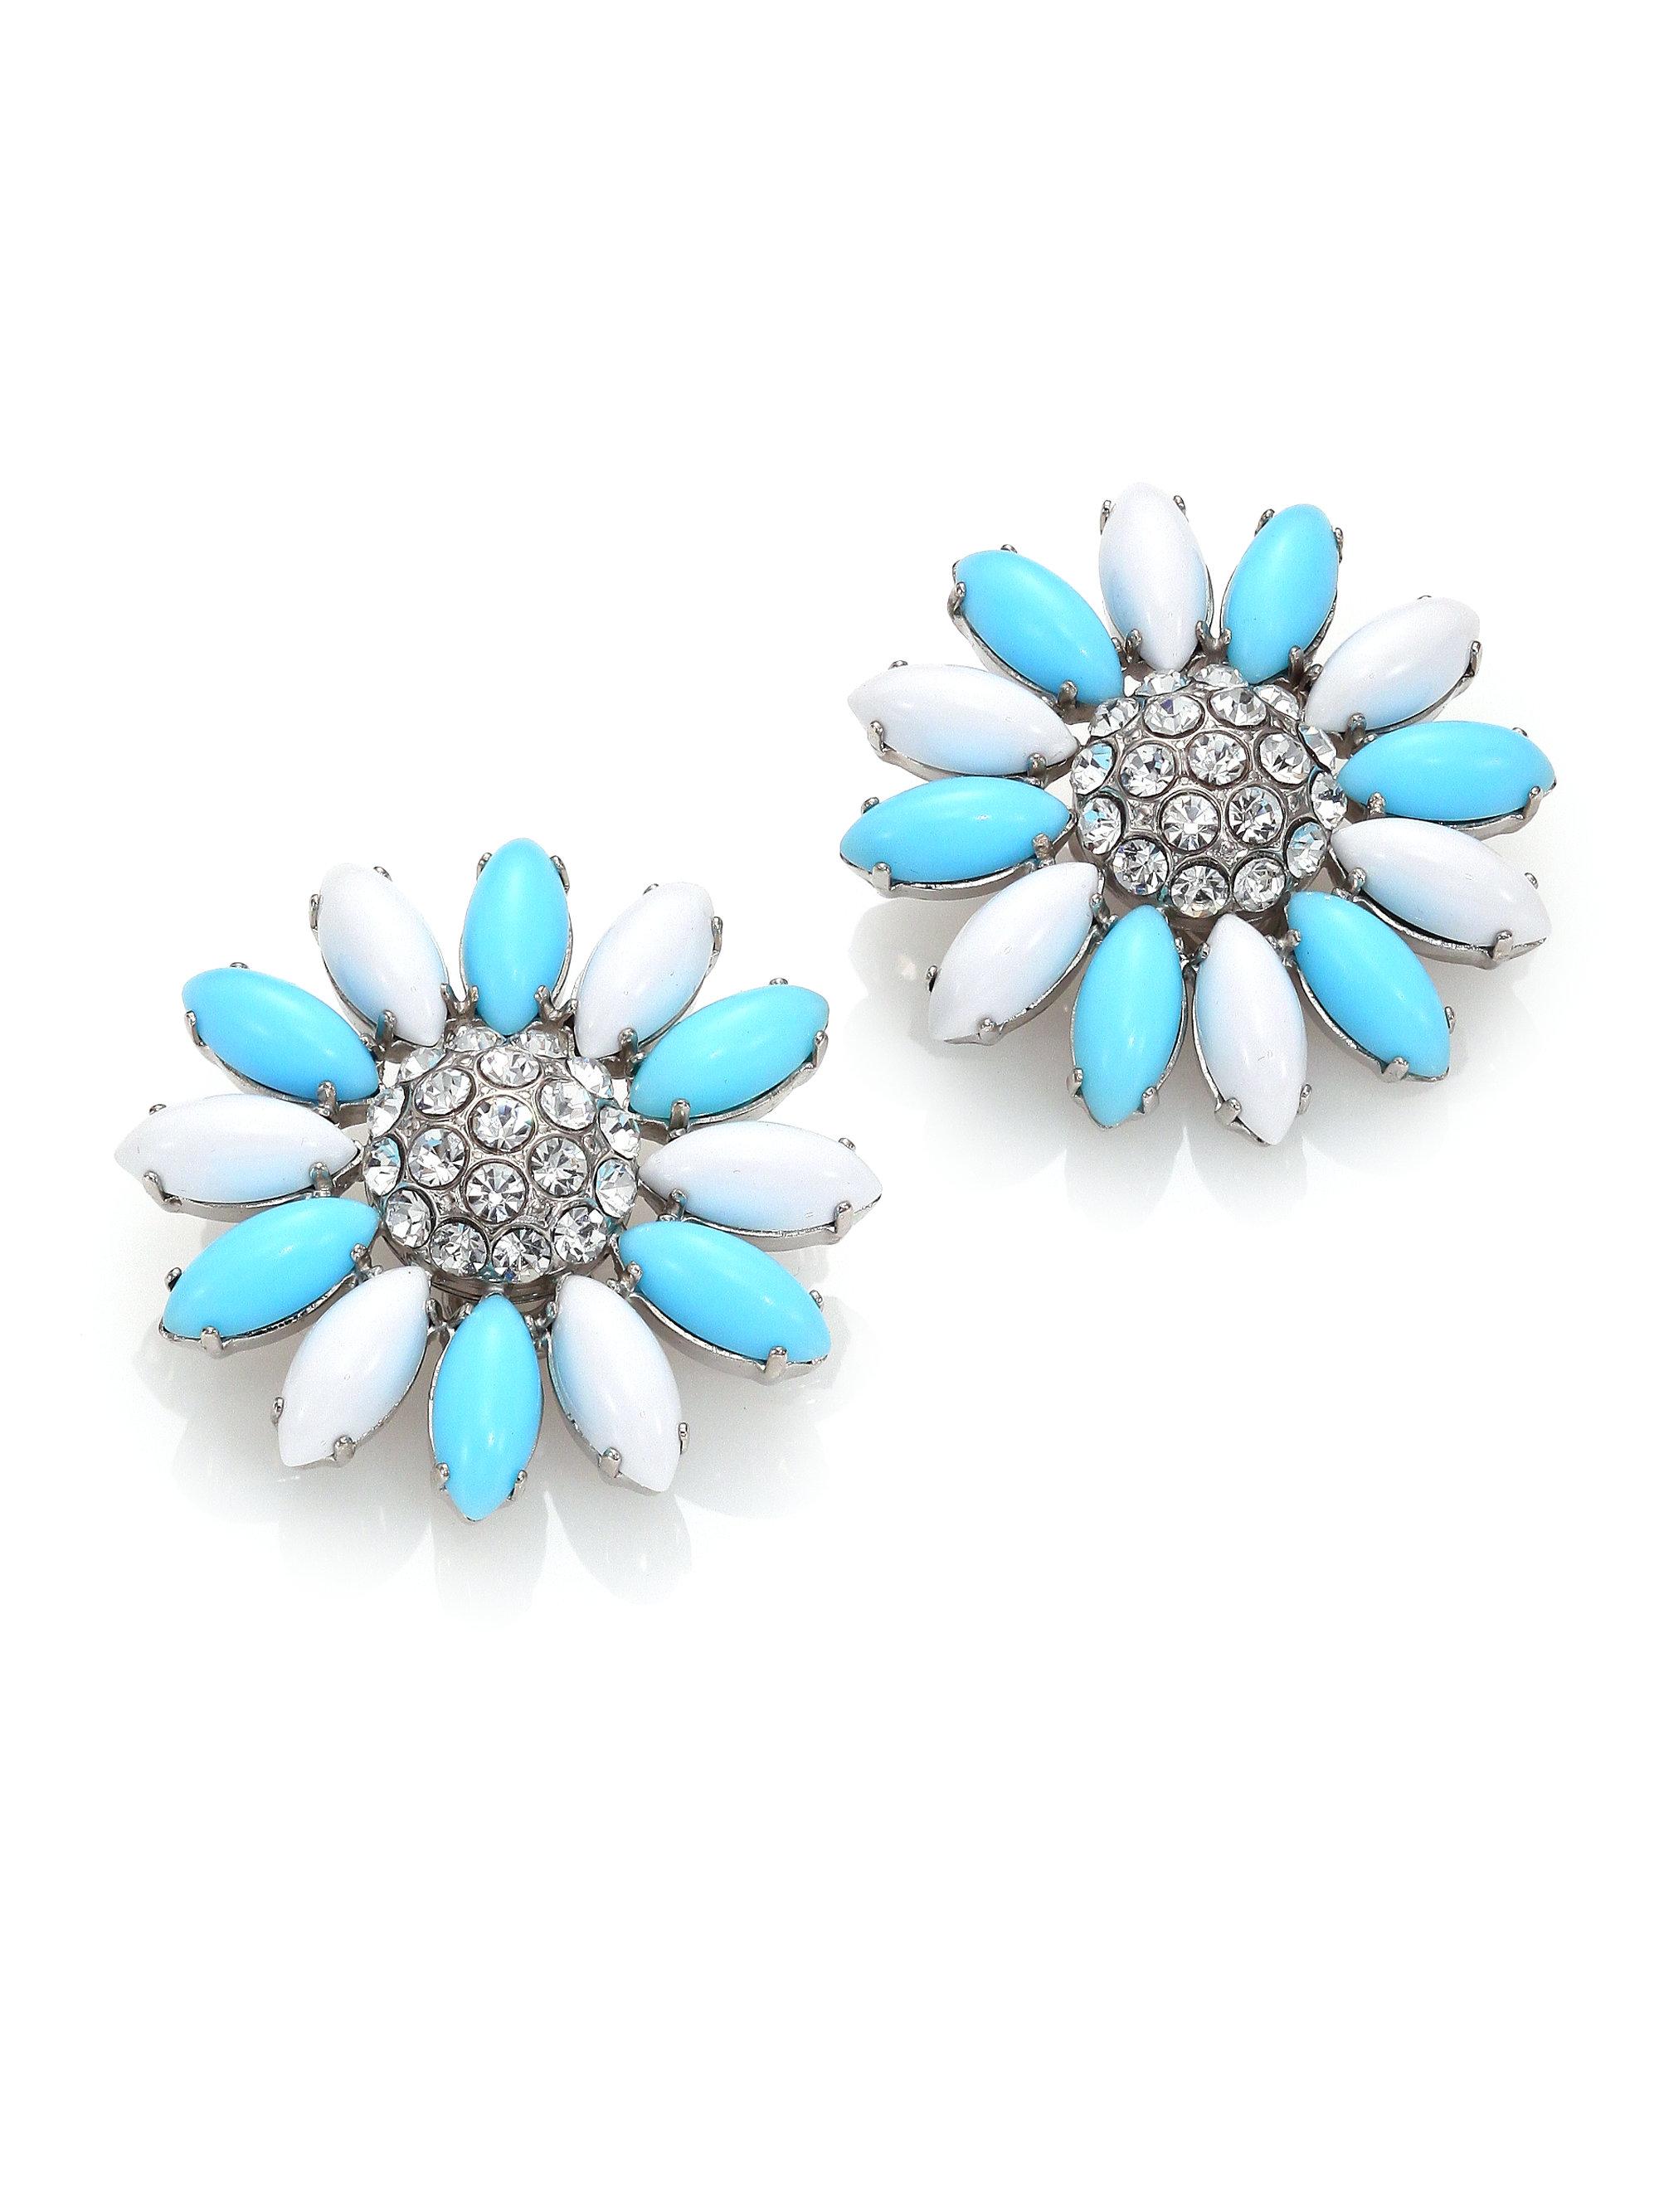 Daisy earrings with crystals - Multicolour Miu Miu Yr1sGiWSDk